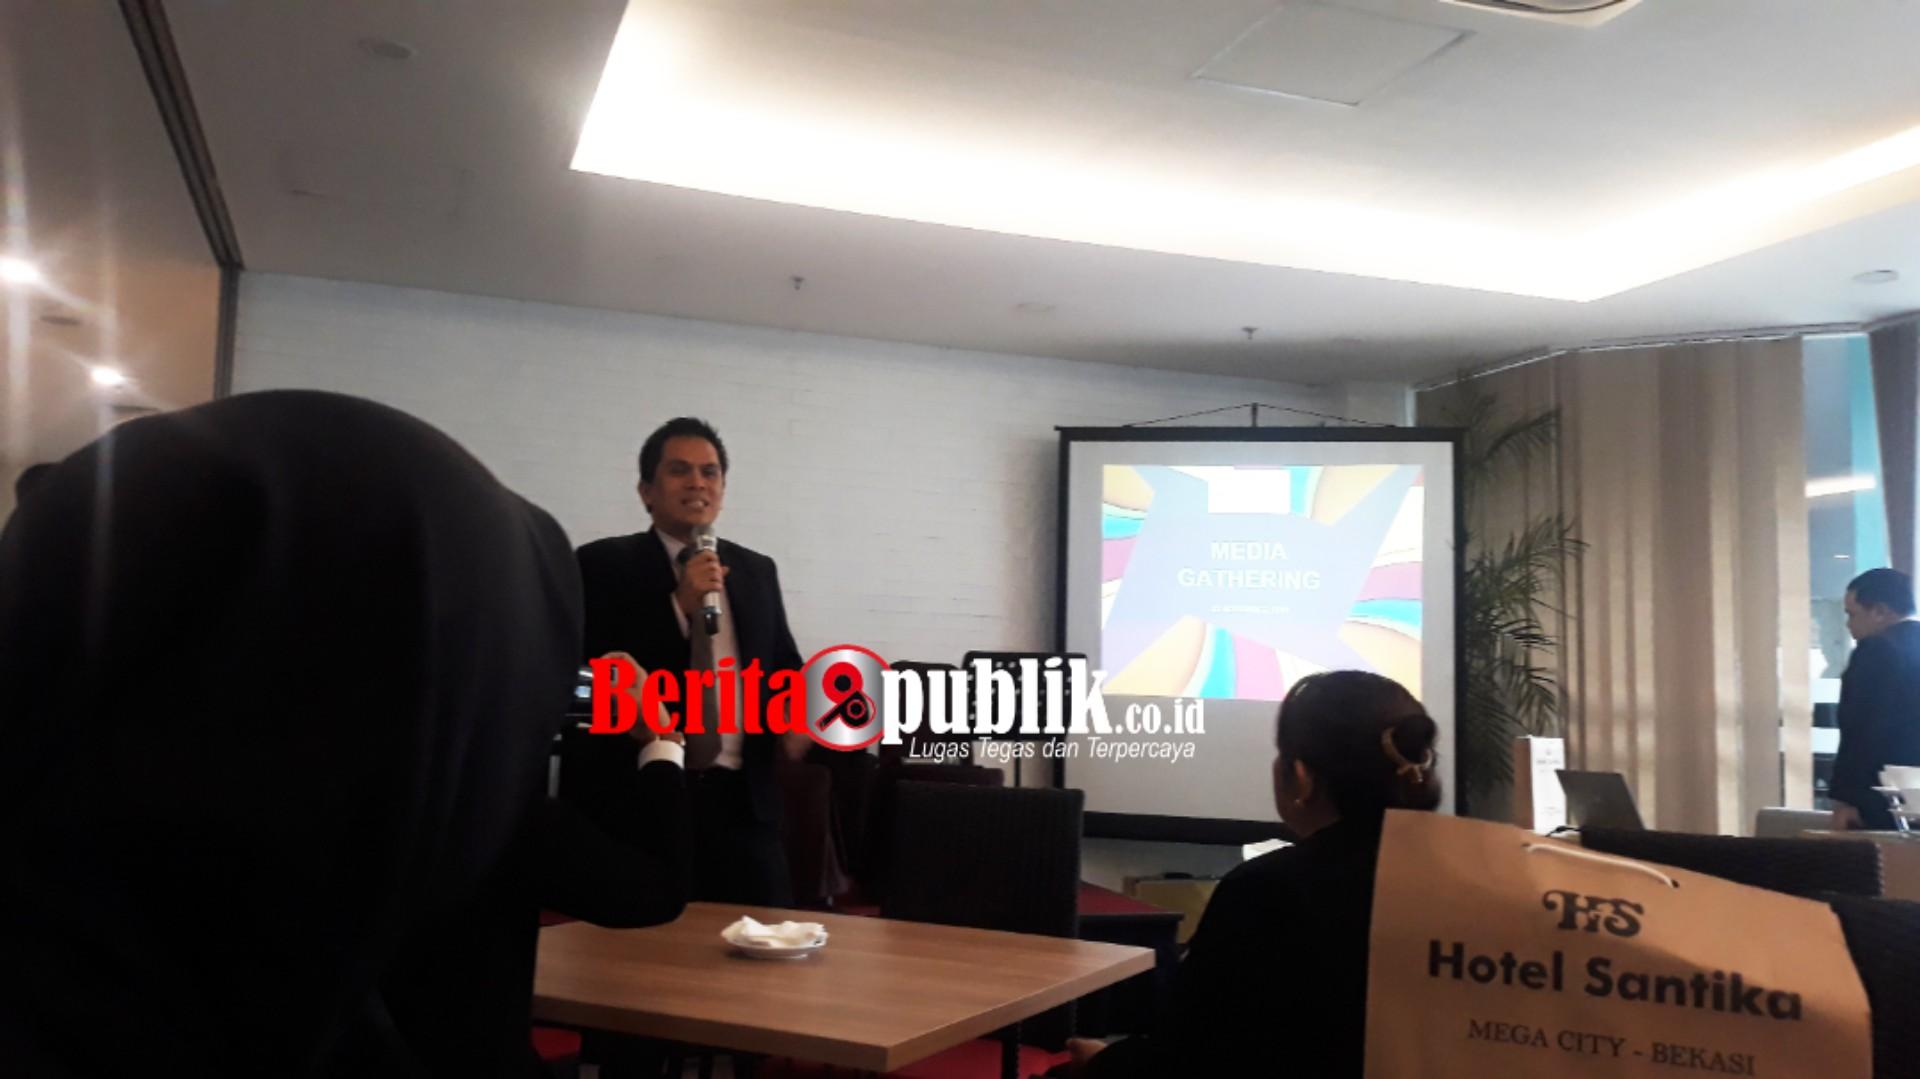 General Manager Hotel Santika Mega City Bekasi, Hendra Gunawan.